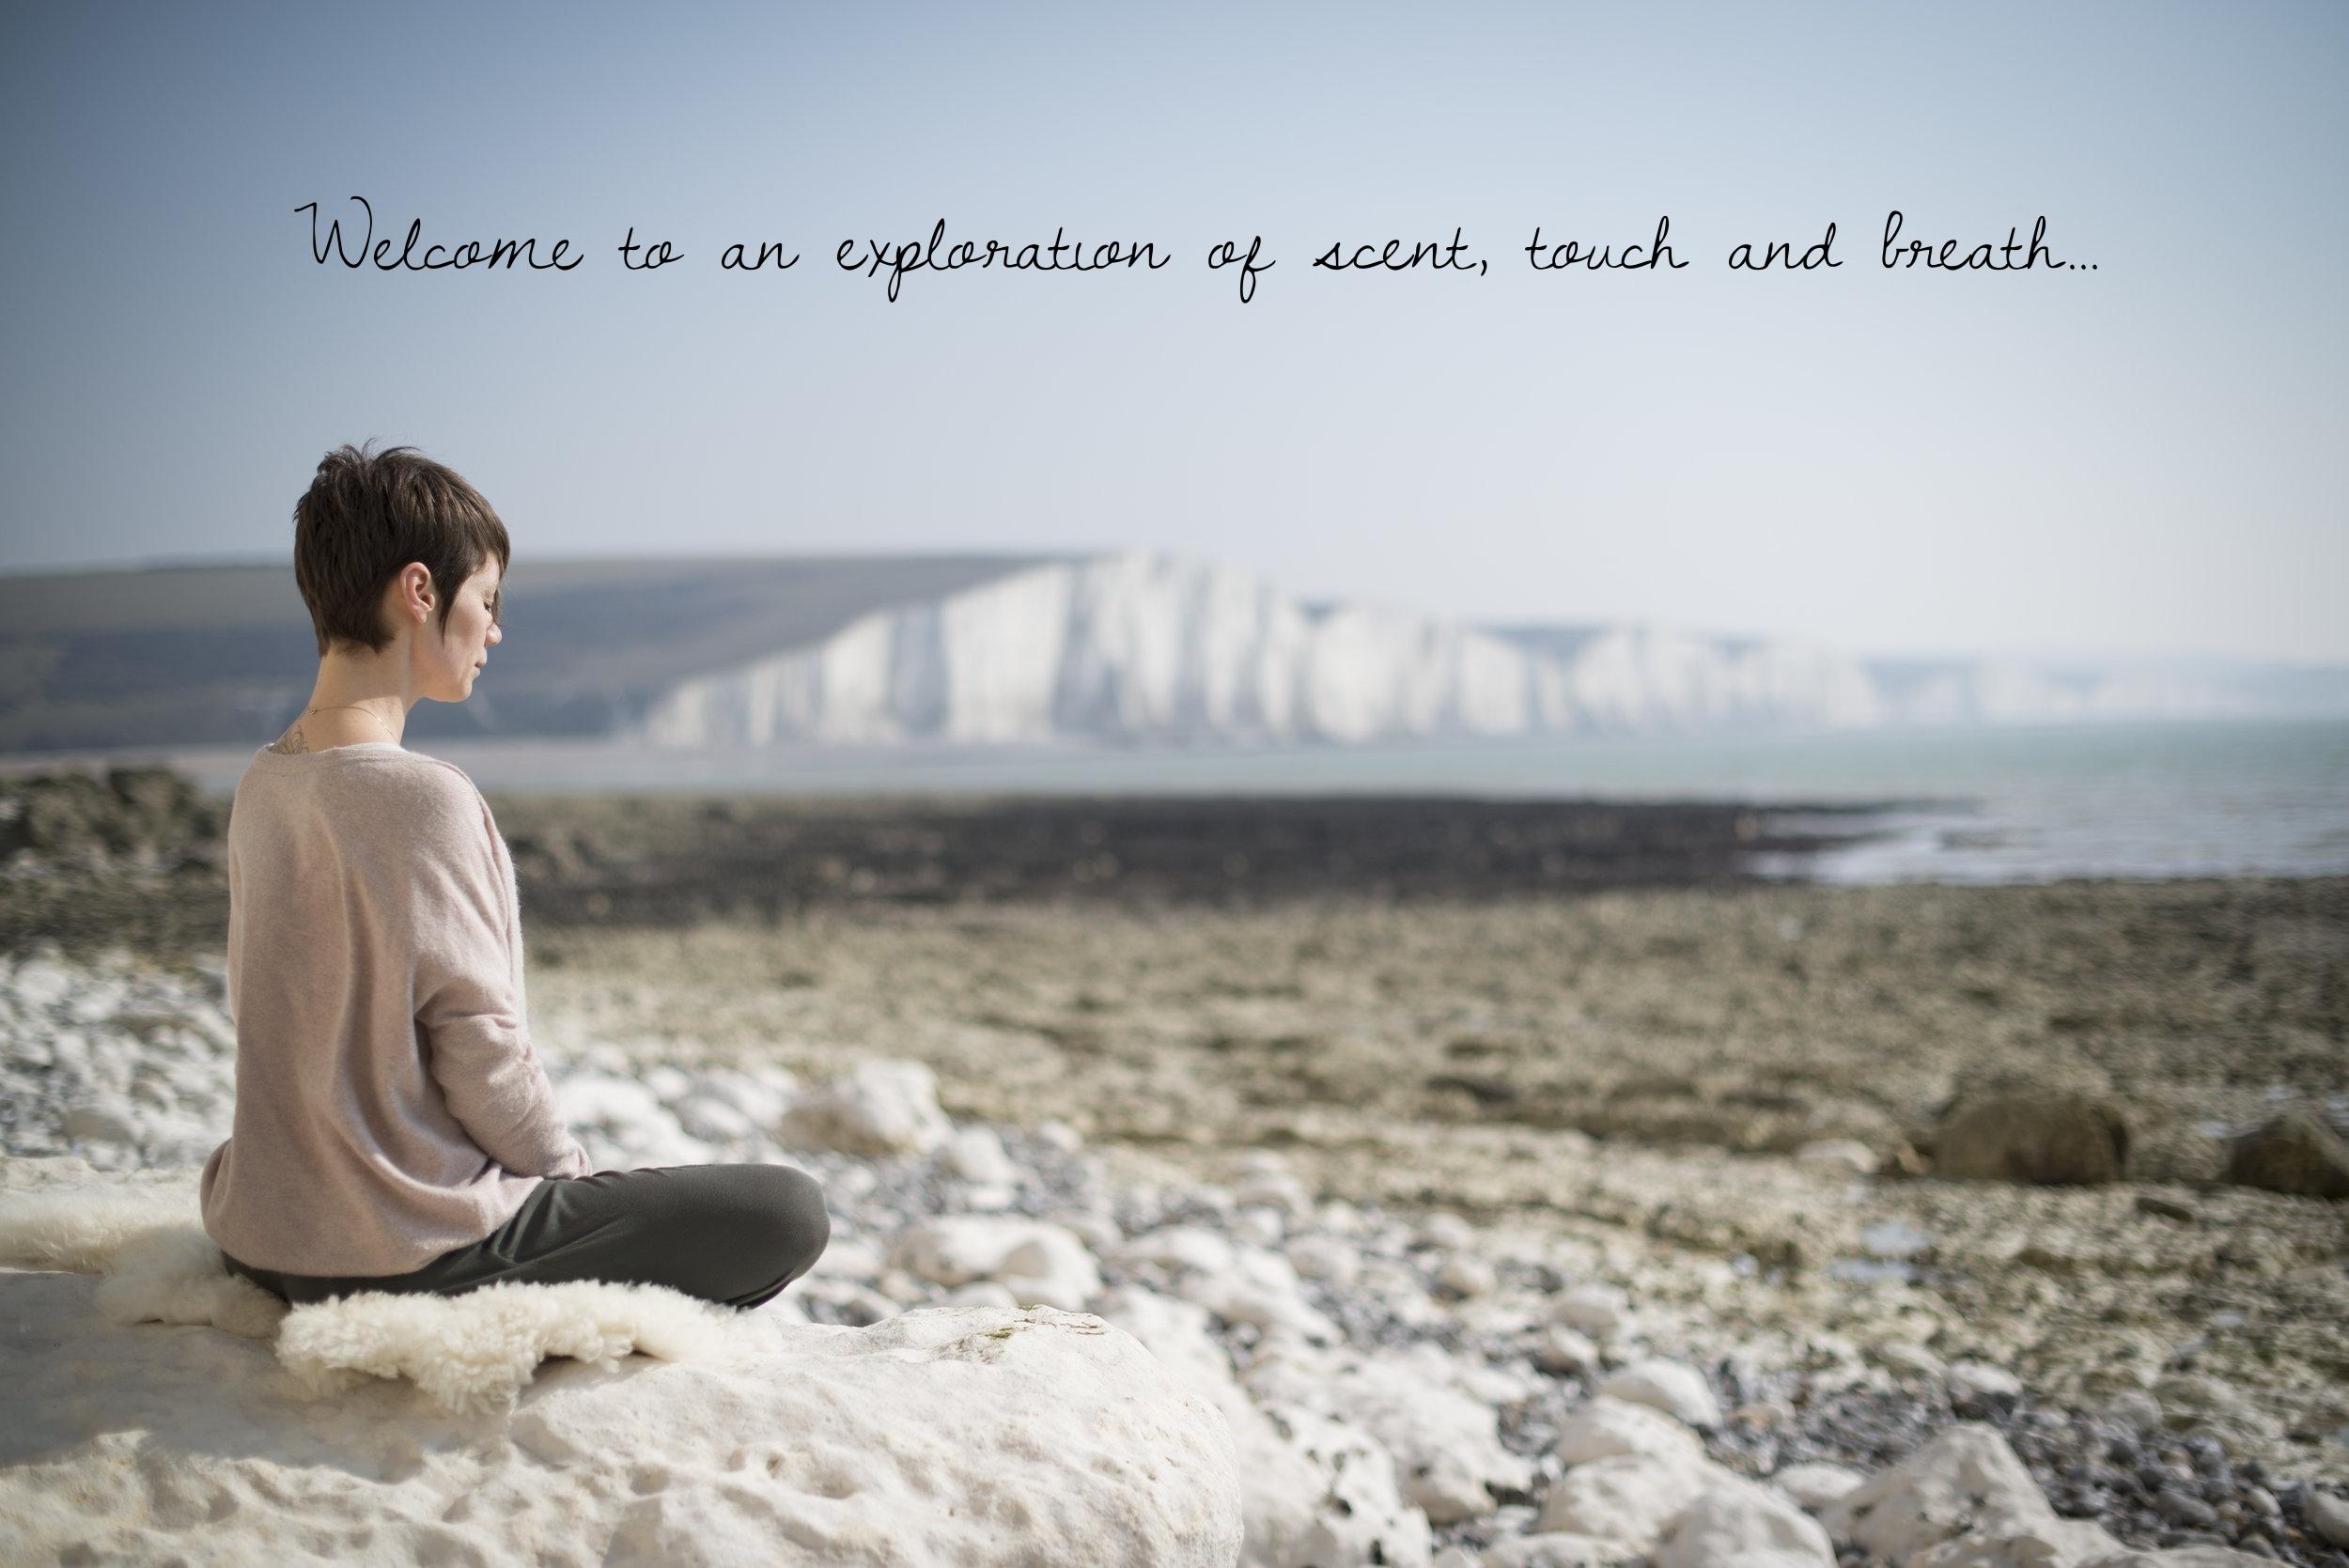 Stillness and Meditation by the Sea